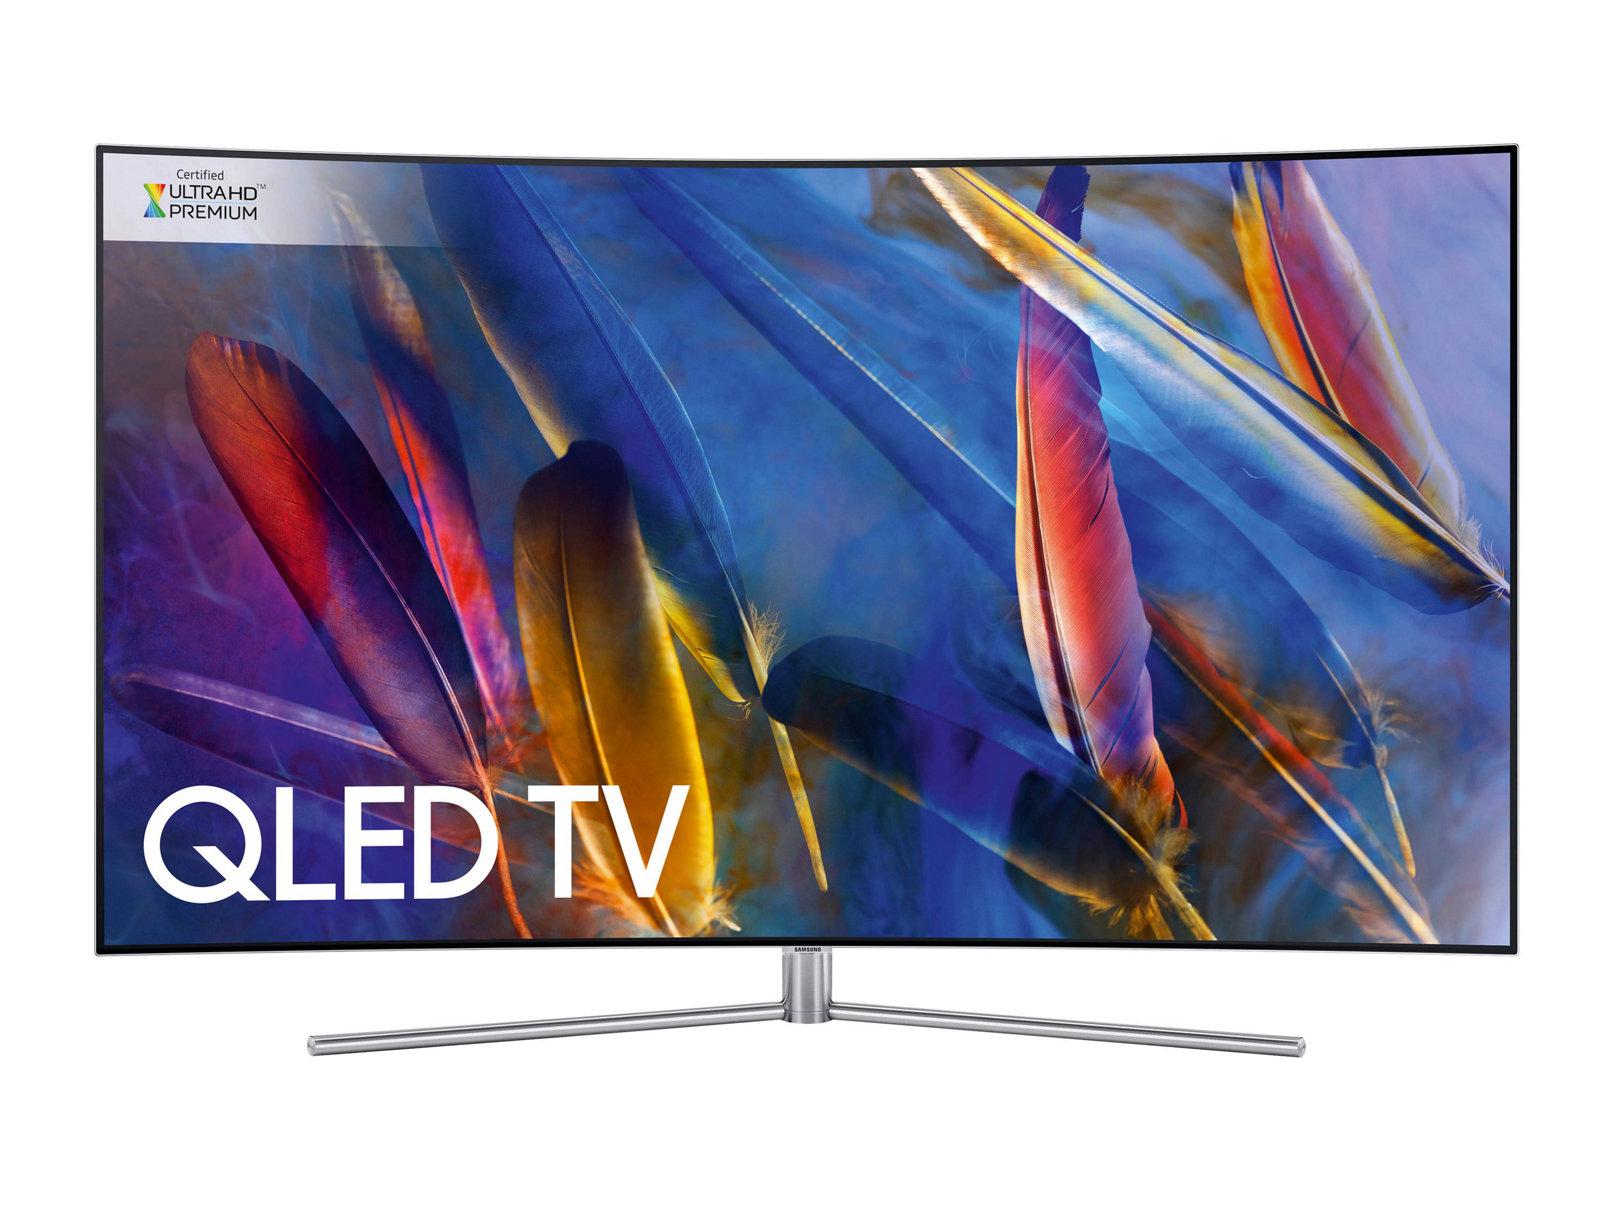 تلويزيون کيولد هوشمند خميده سامسونگ 65Q78 سايز 65 اينچ   Samsung 65Q78 Curved Smart QLED TV 65 Inch